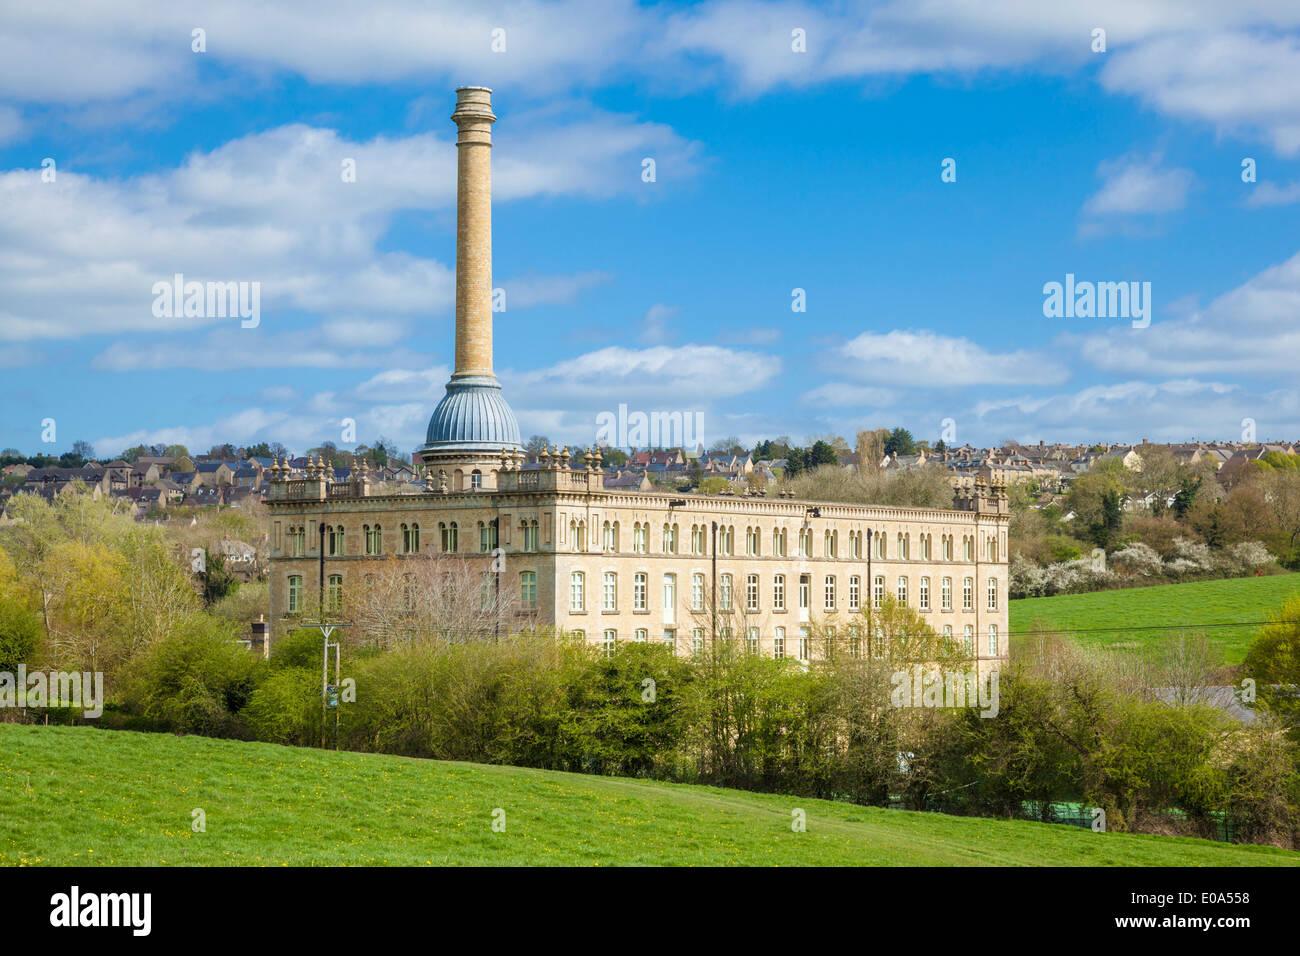 Bliss Mill Chipping Norton Cotswolds Oxforshire England UK EU Europe - Stock Image